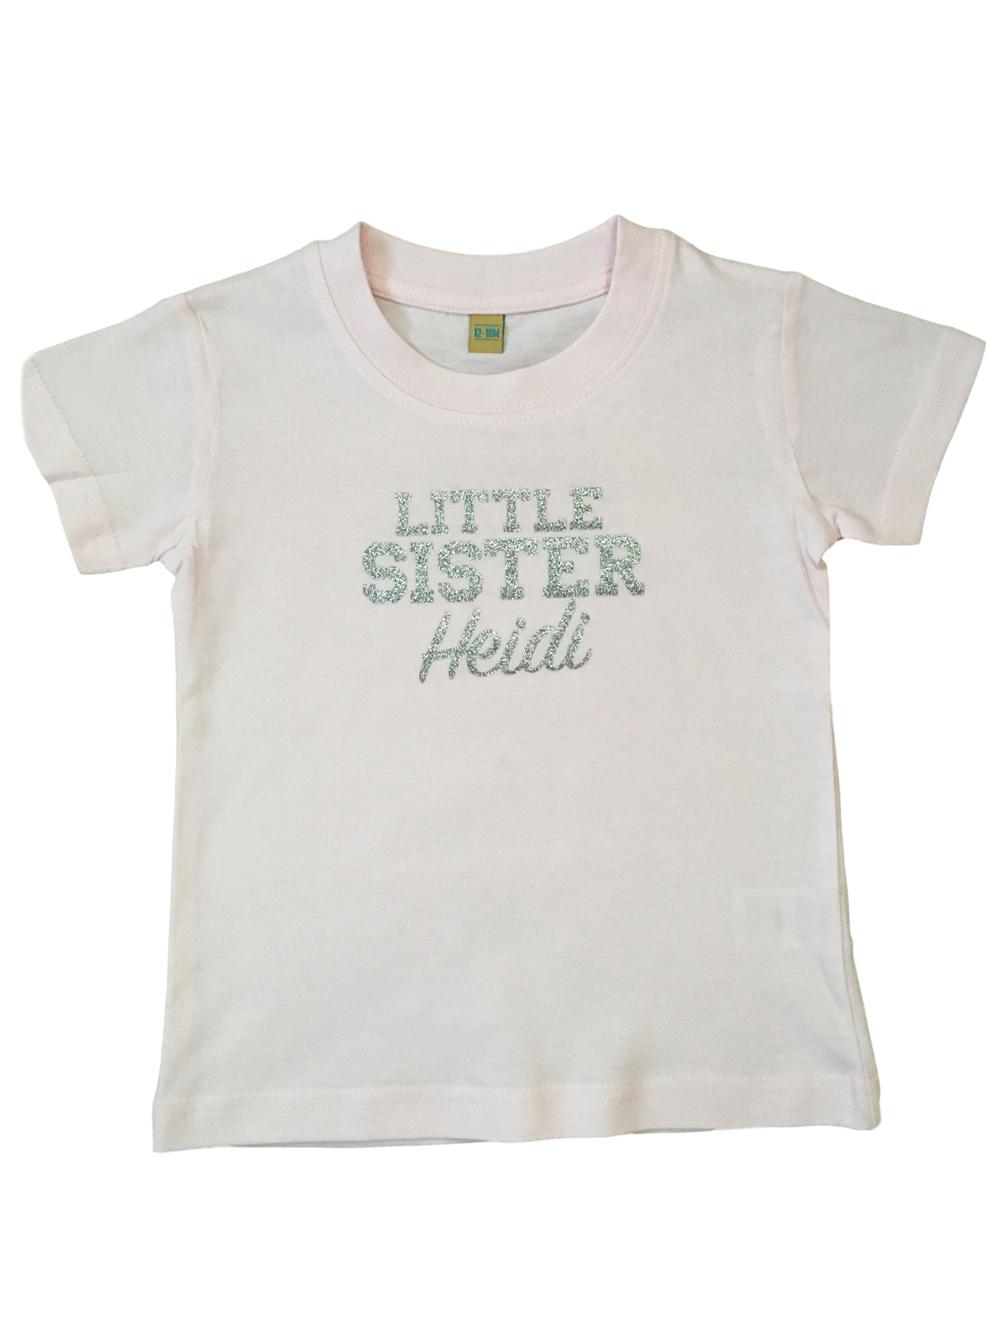 Personalised Little Sister Tshirt